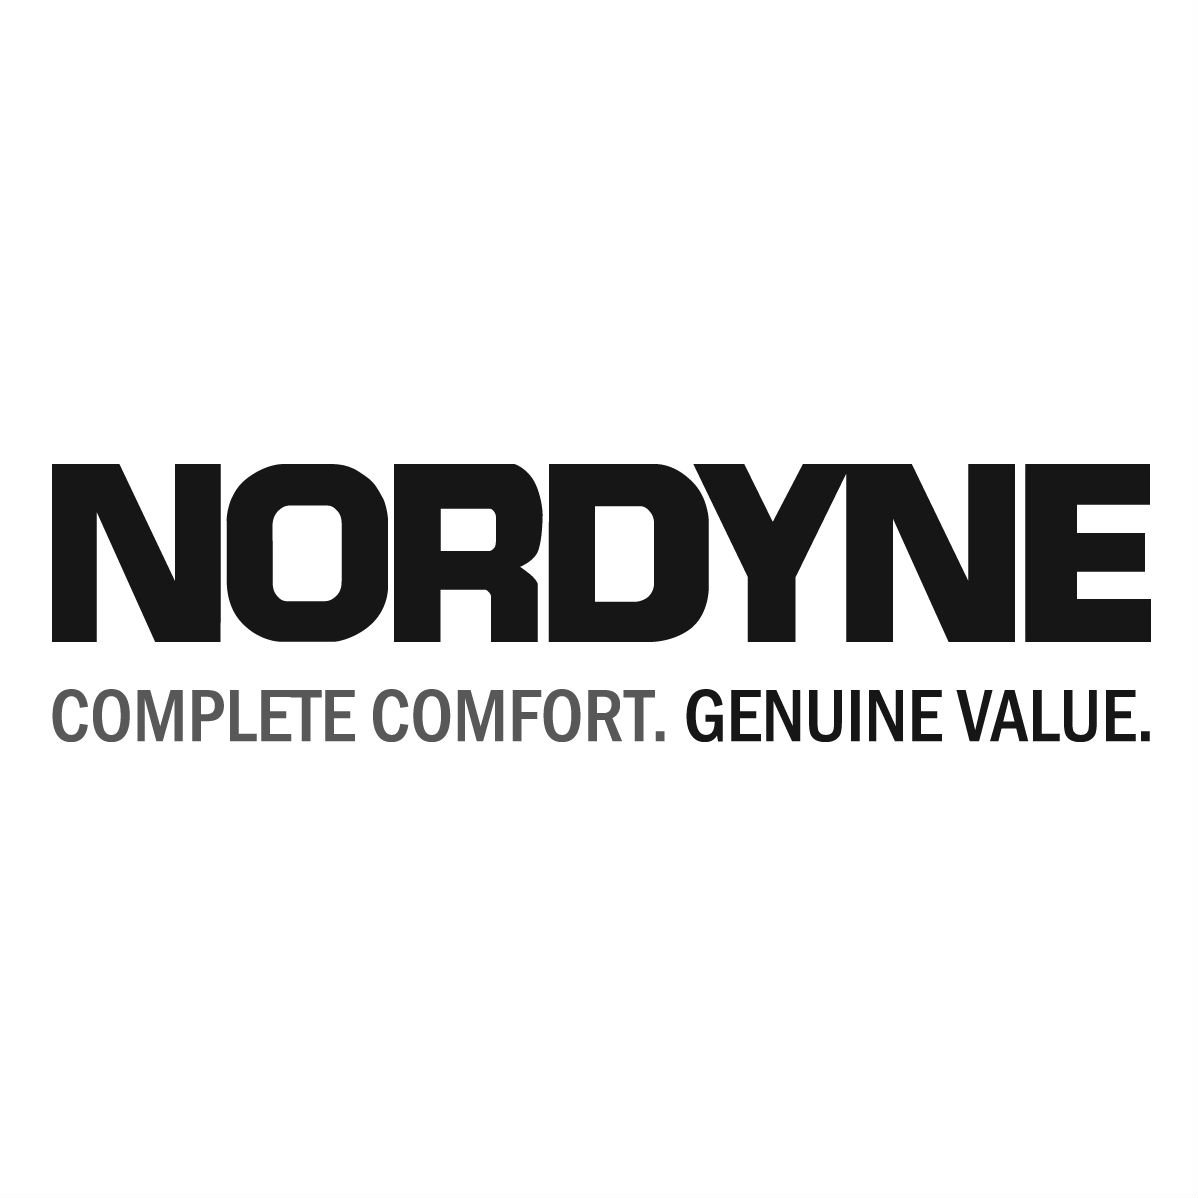 Miller Nordyne Intherthem Broan Furnace Door Switch 632125 632125R